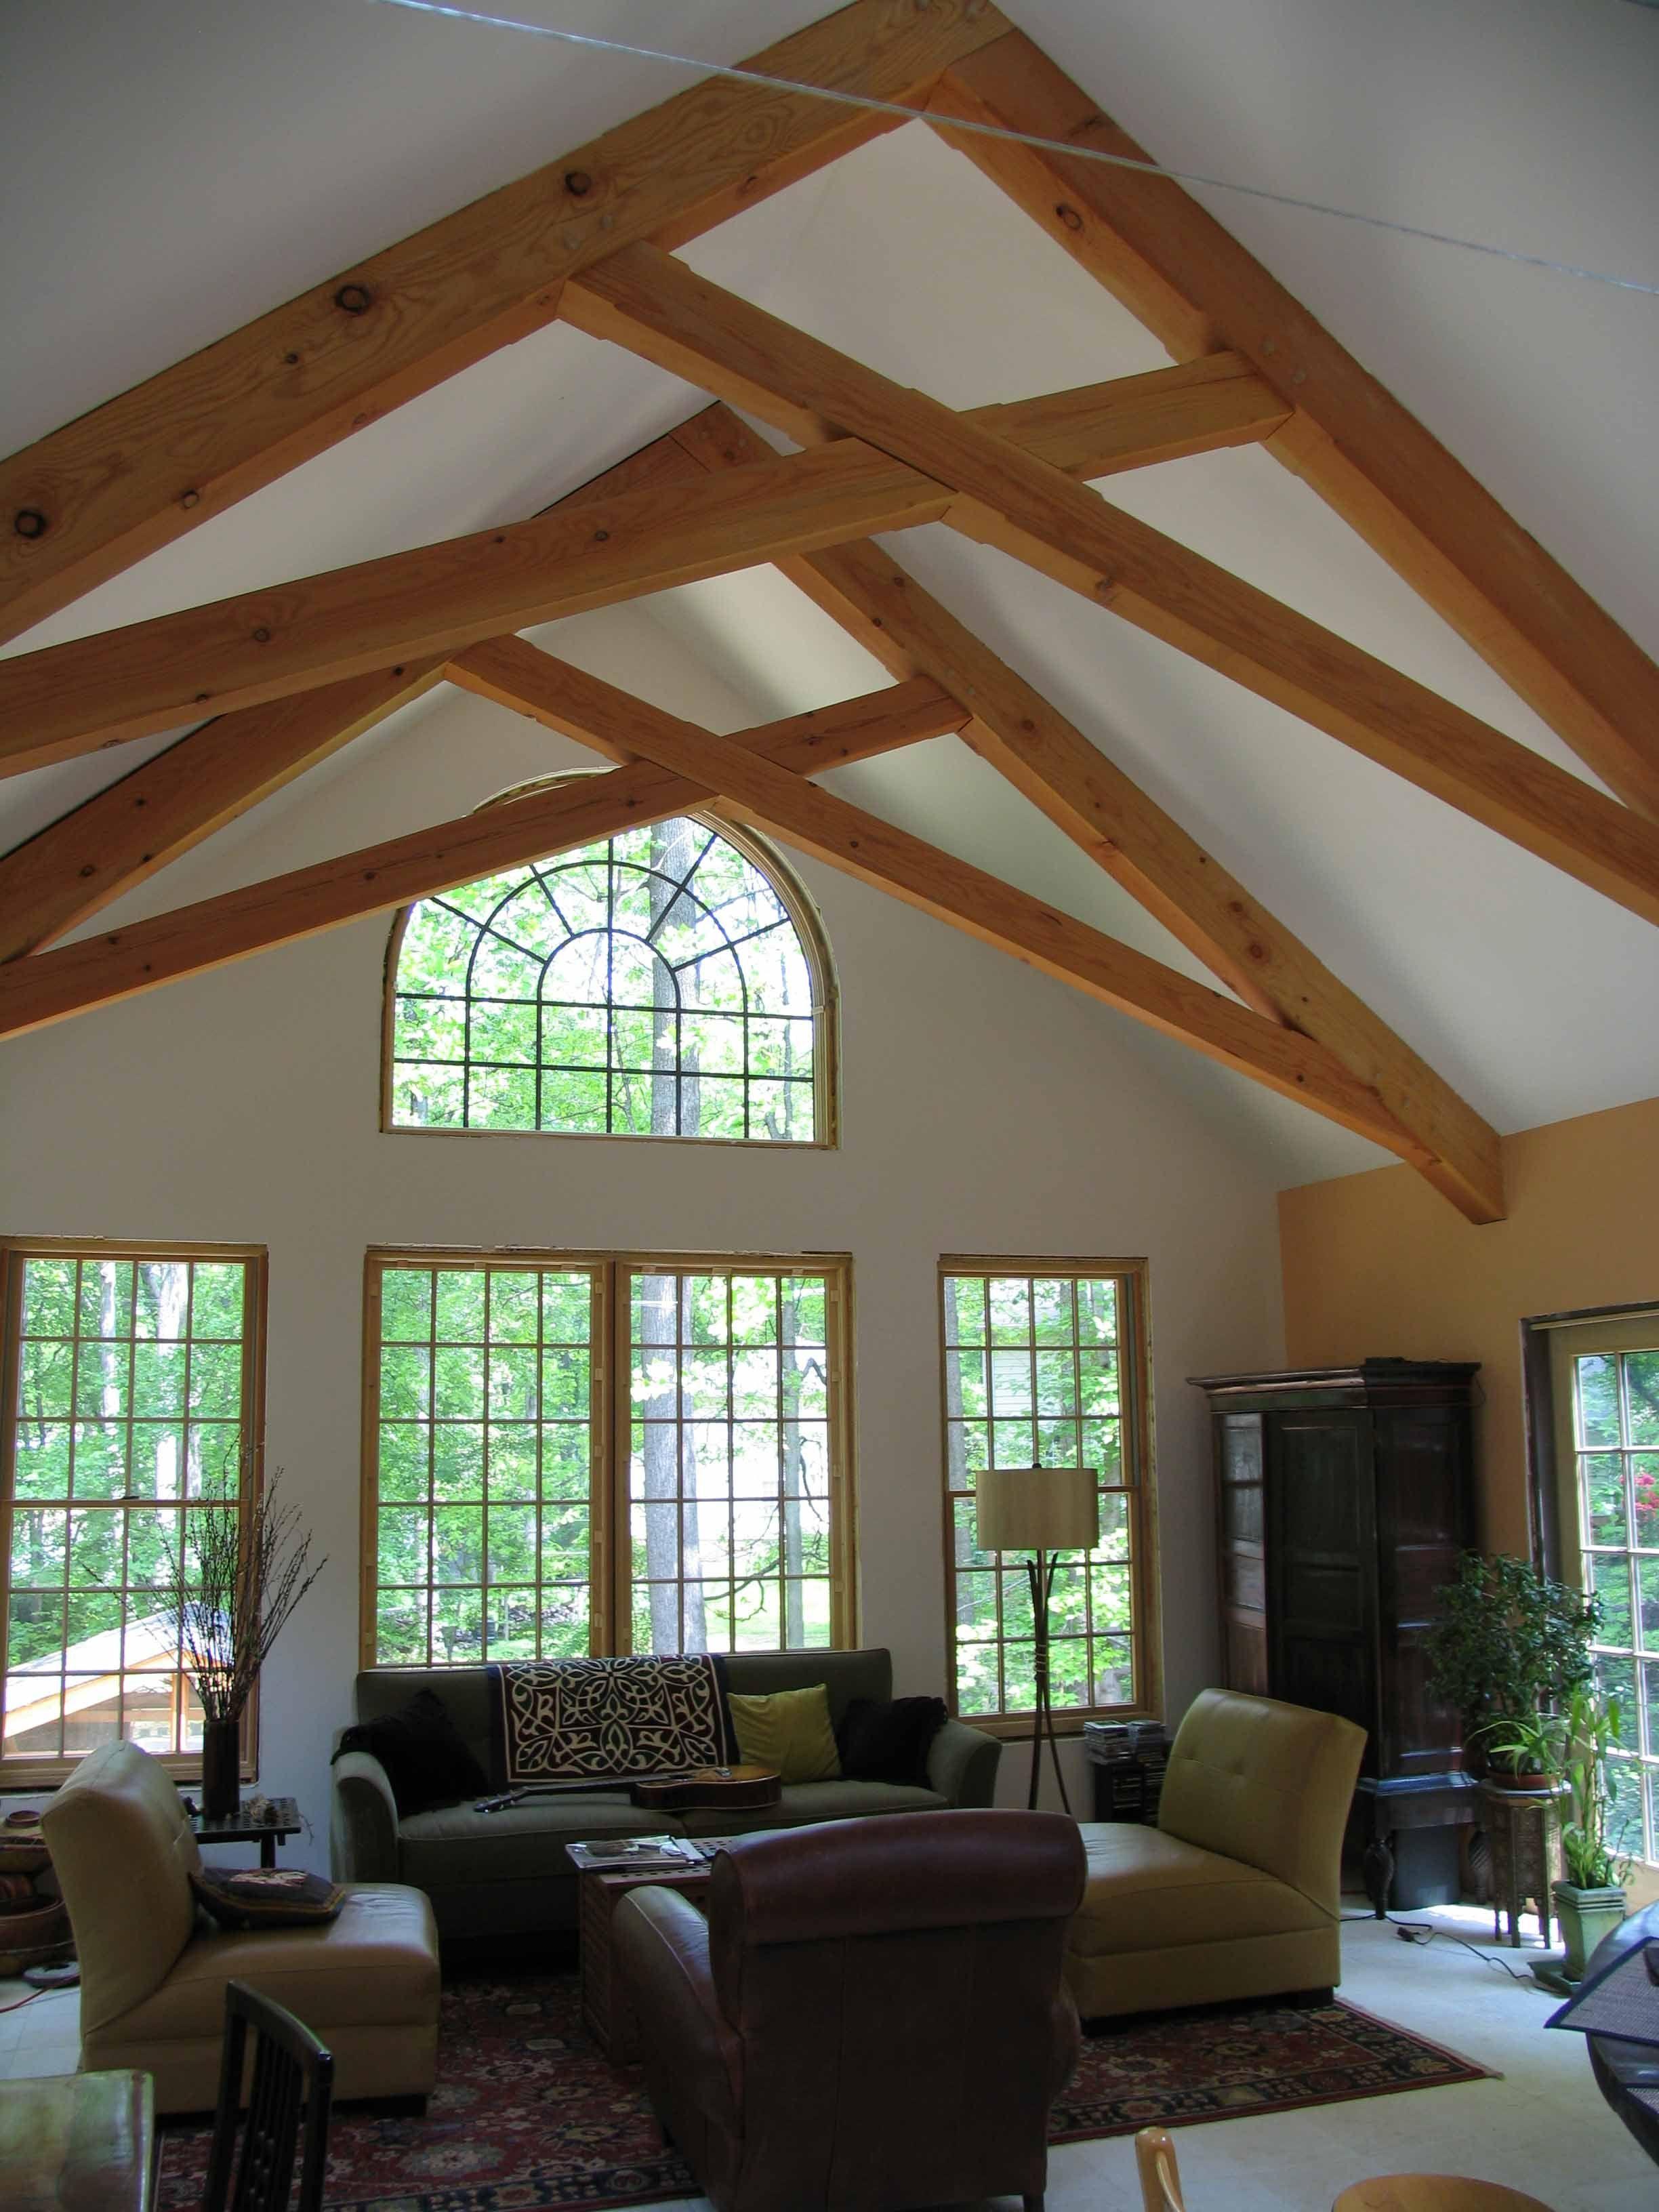 Private residence scissor trusses scissor trusses for Exposed roof truss design